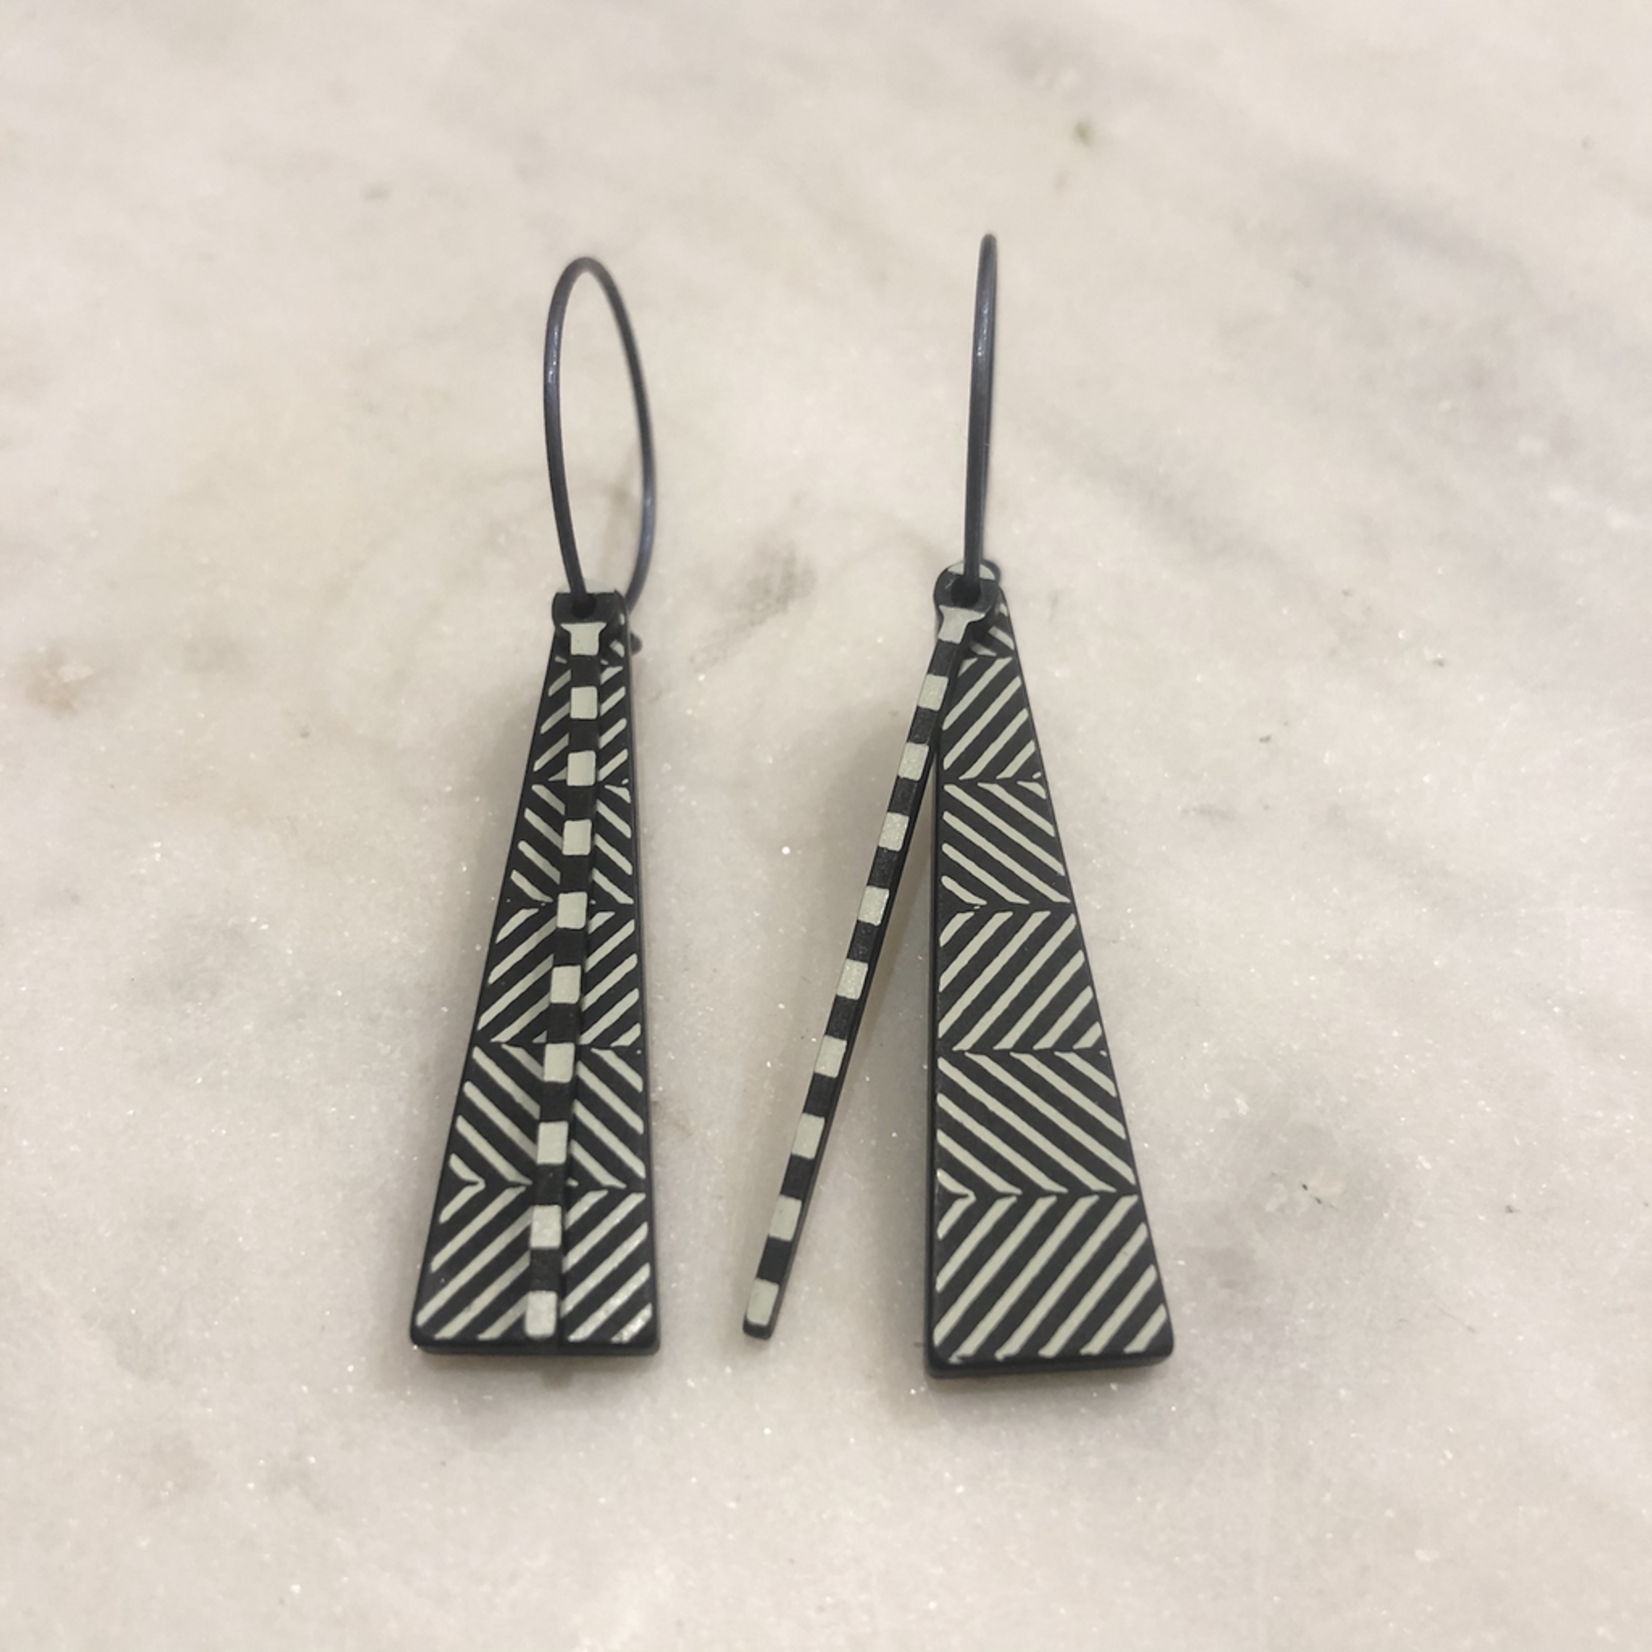 Lene Lundberg Black Triangle with White Diagonal Stripes Abstract Earrings